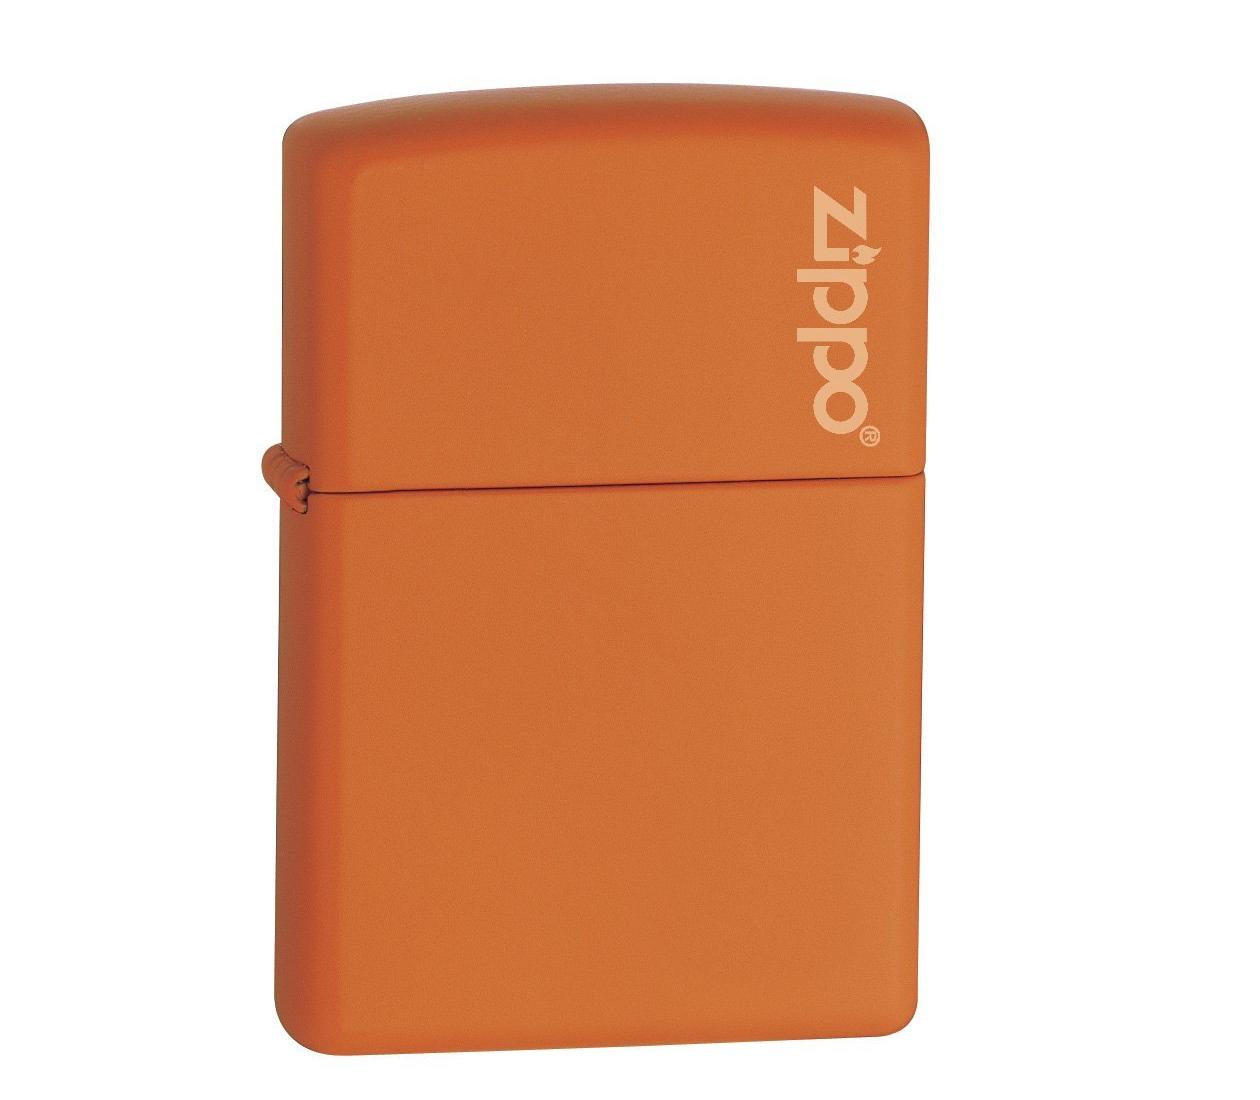 Bật lửa Zippo Orange Matte Lighter with Zippo logo